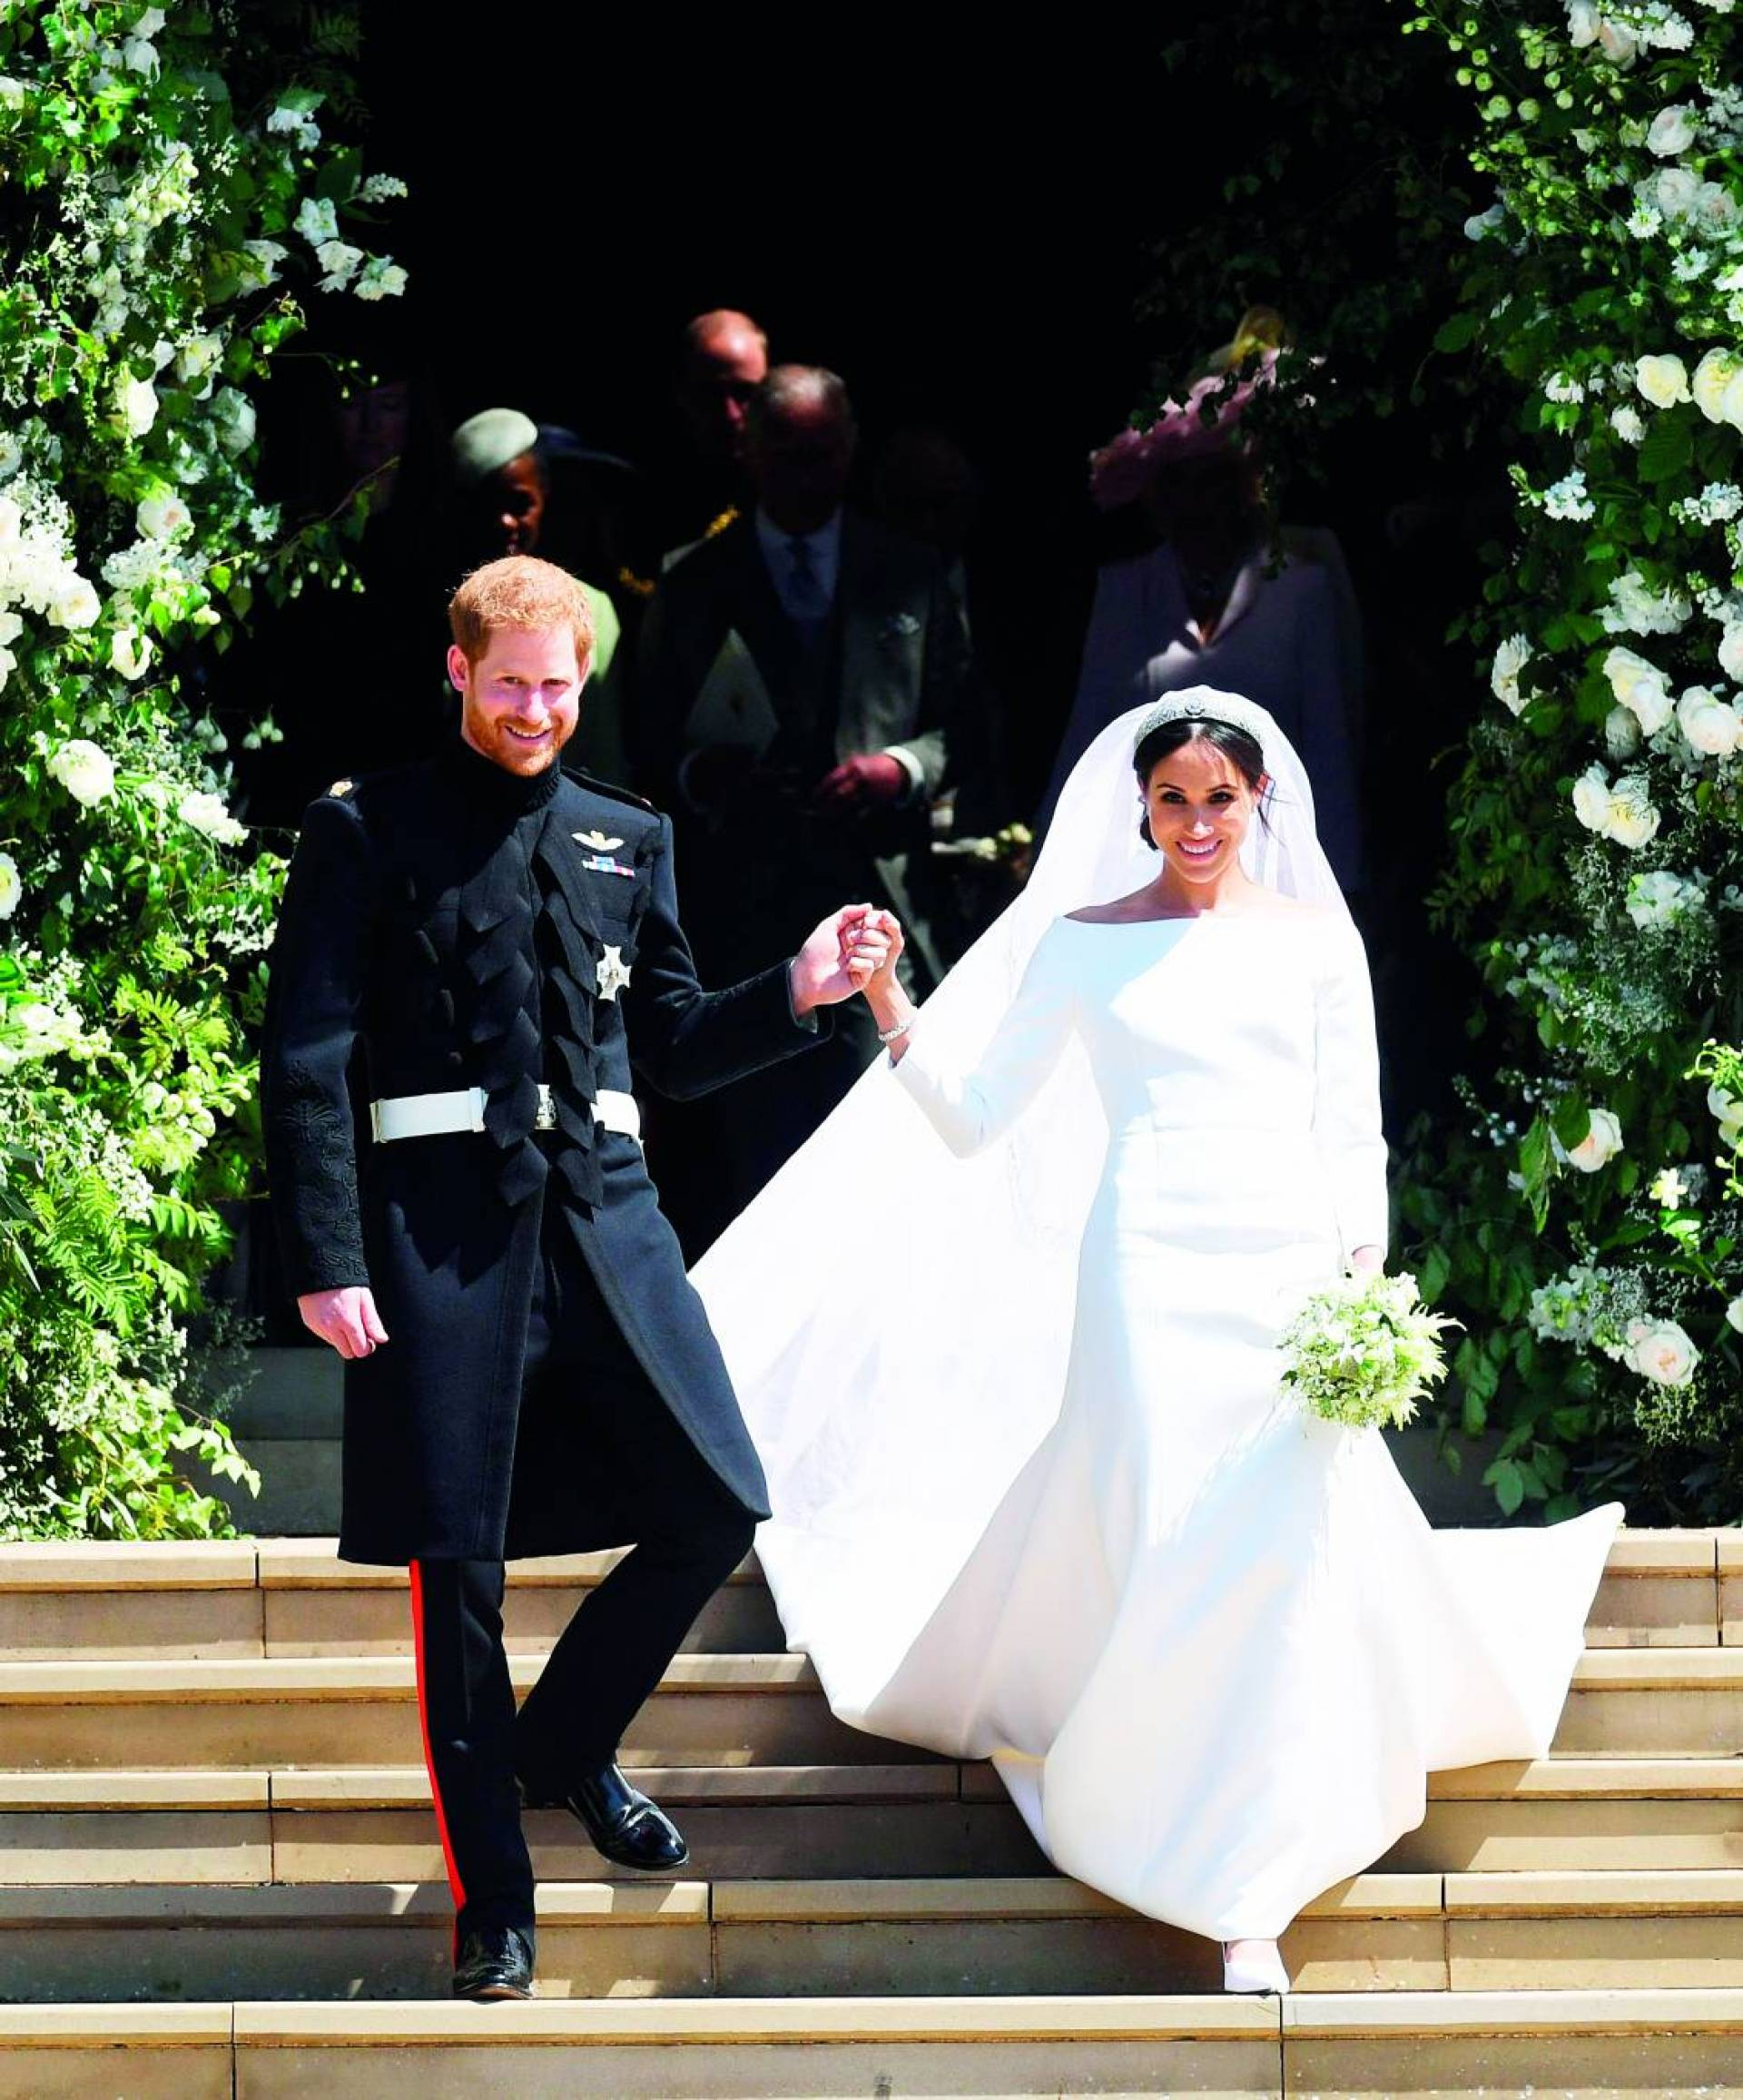 Megan And Harry Wedding.Wedding By Prince Harry And Megan Markle Break The British Royal